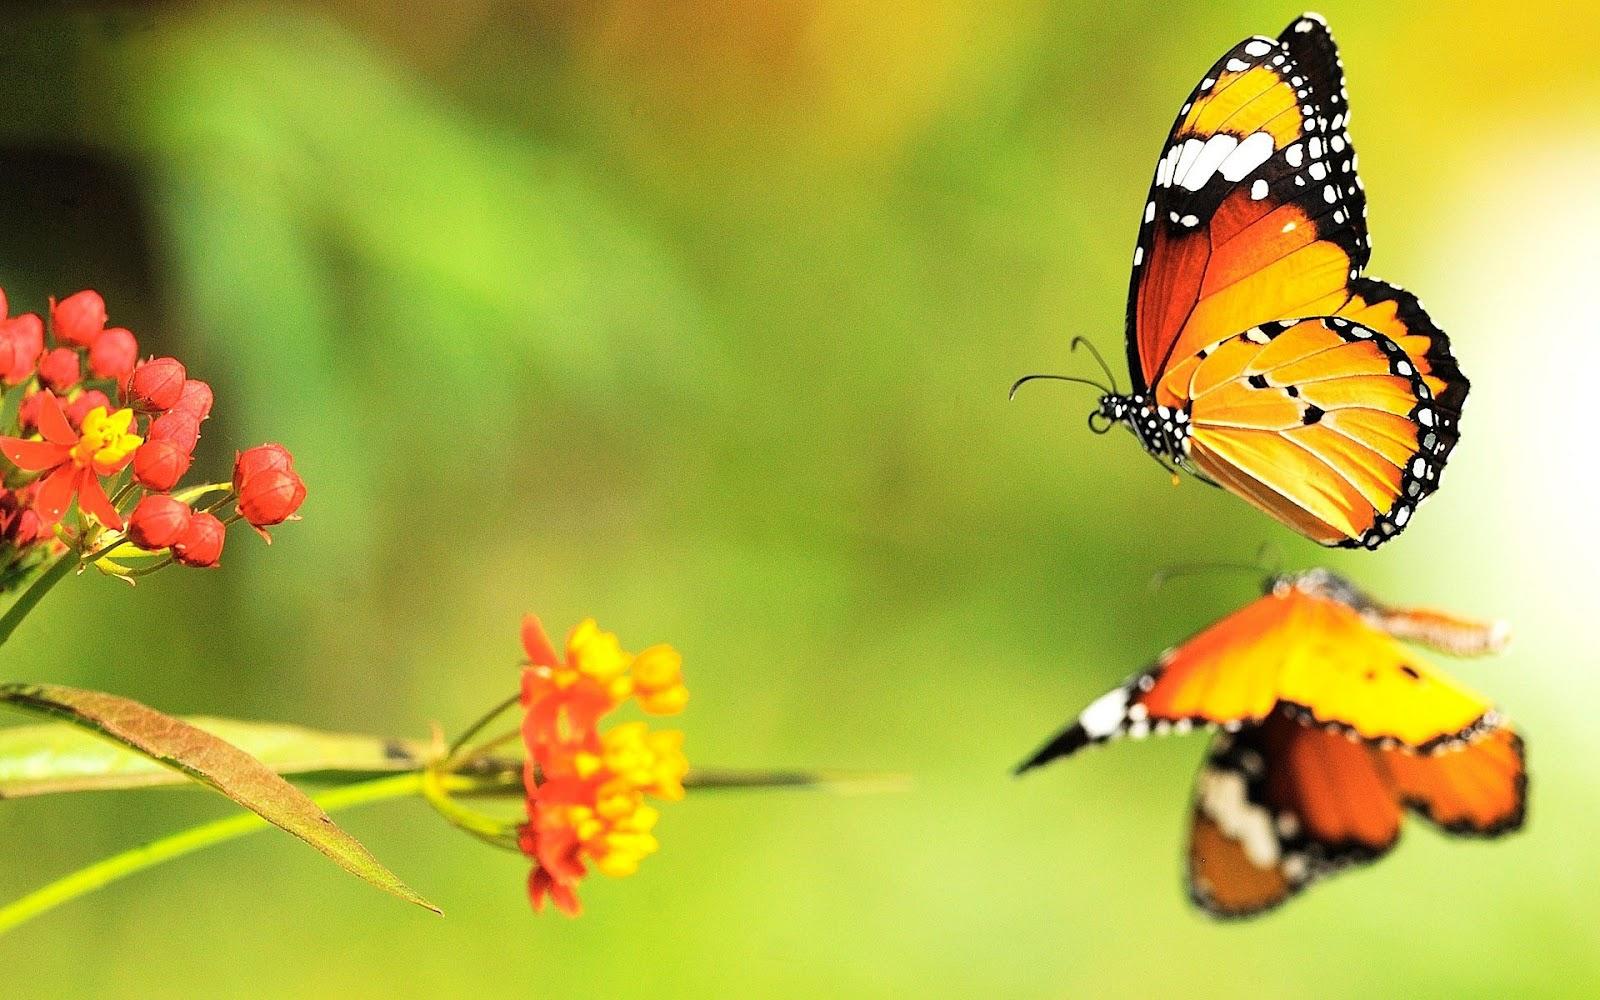 Unique Backgrounds Wallpaper With Butterflies Wallpapersafari